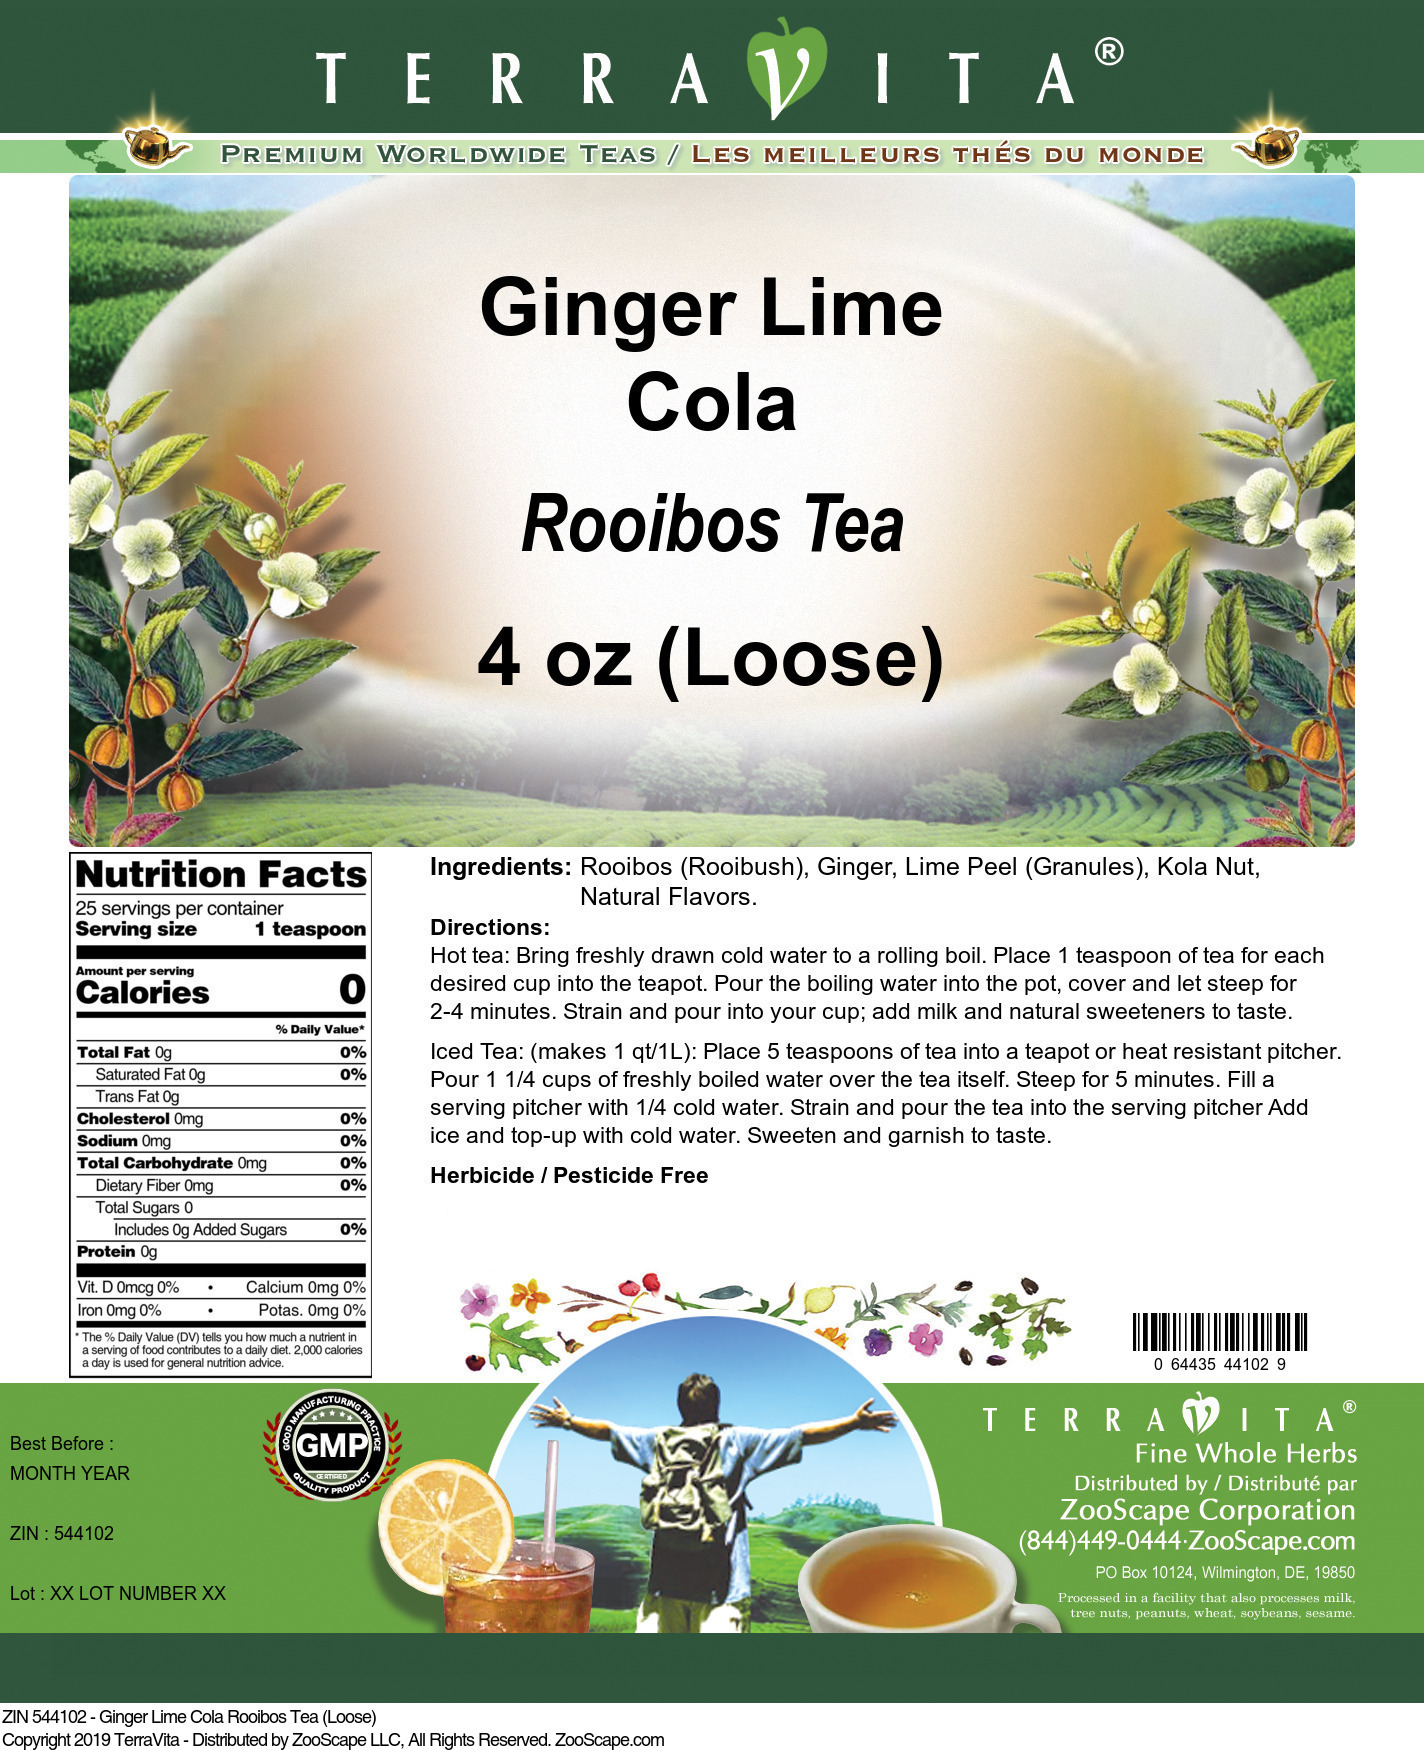 Ginger Lime Cola Rooibos Tea (Loose)